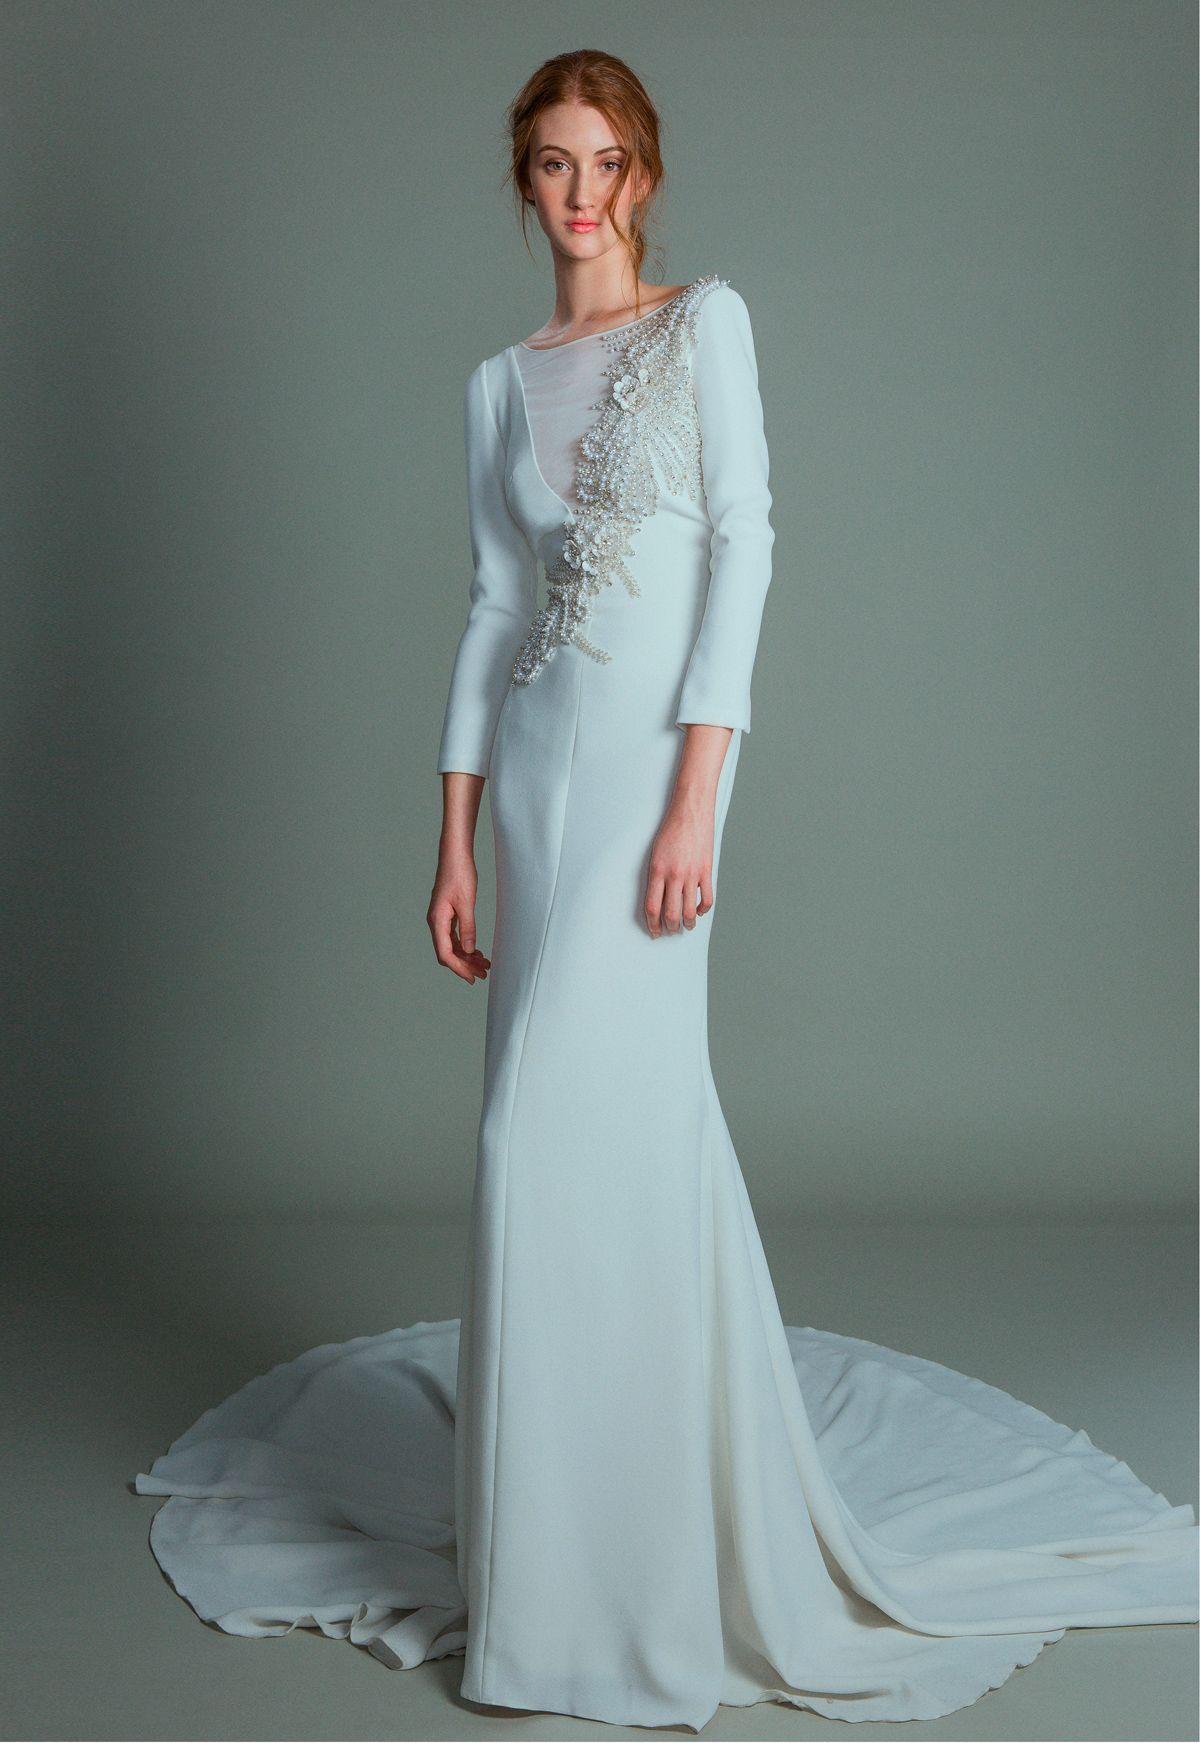 Amazing Vestidos Novia Años 30 Component - All Wedding Dresses ...